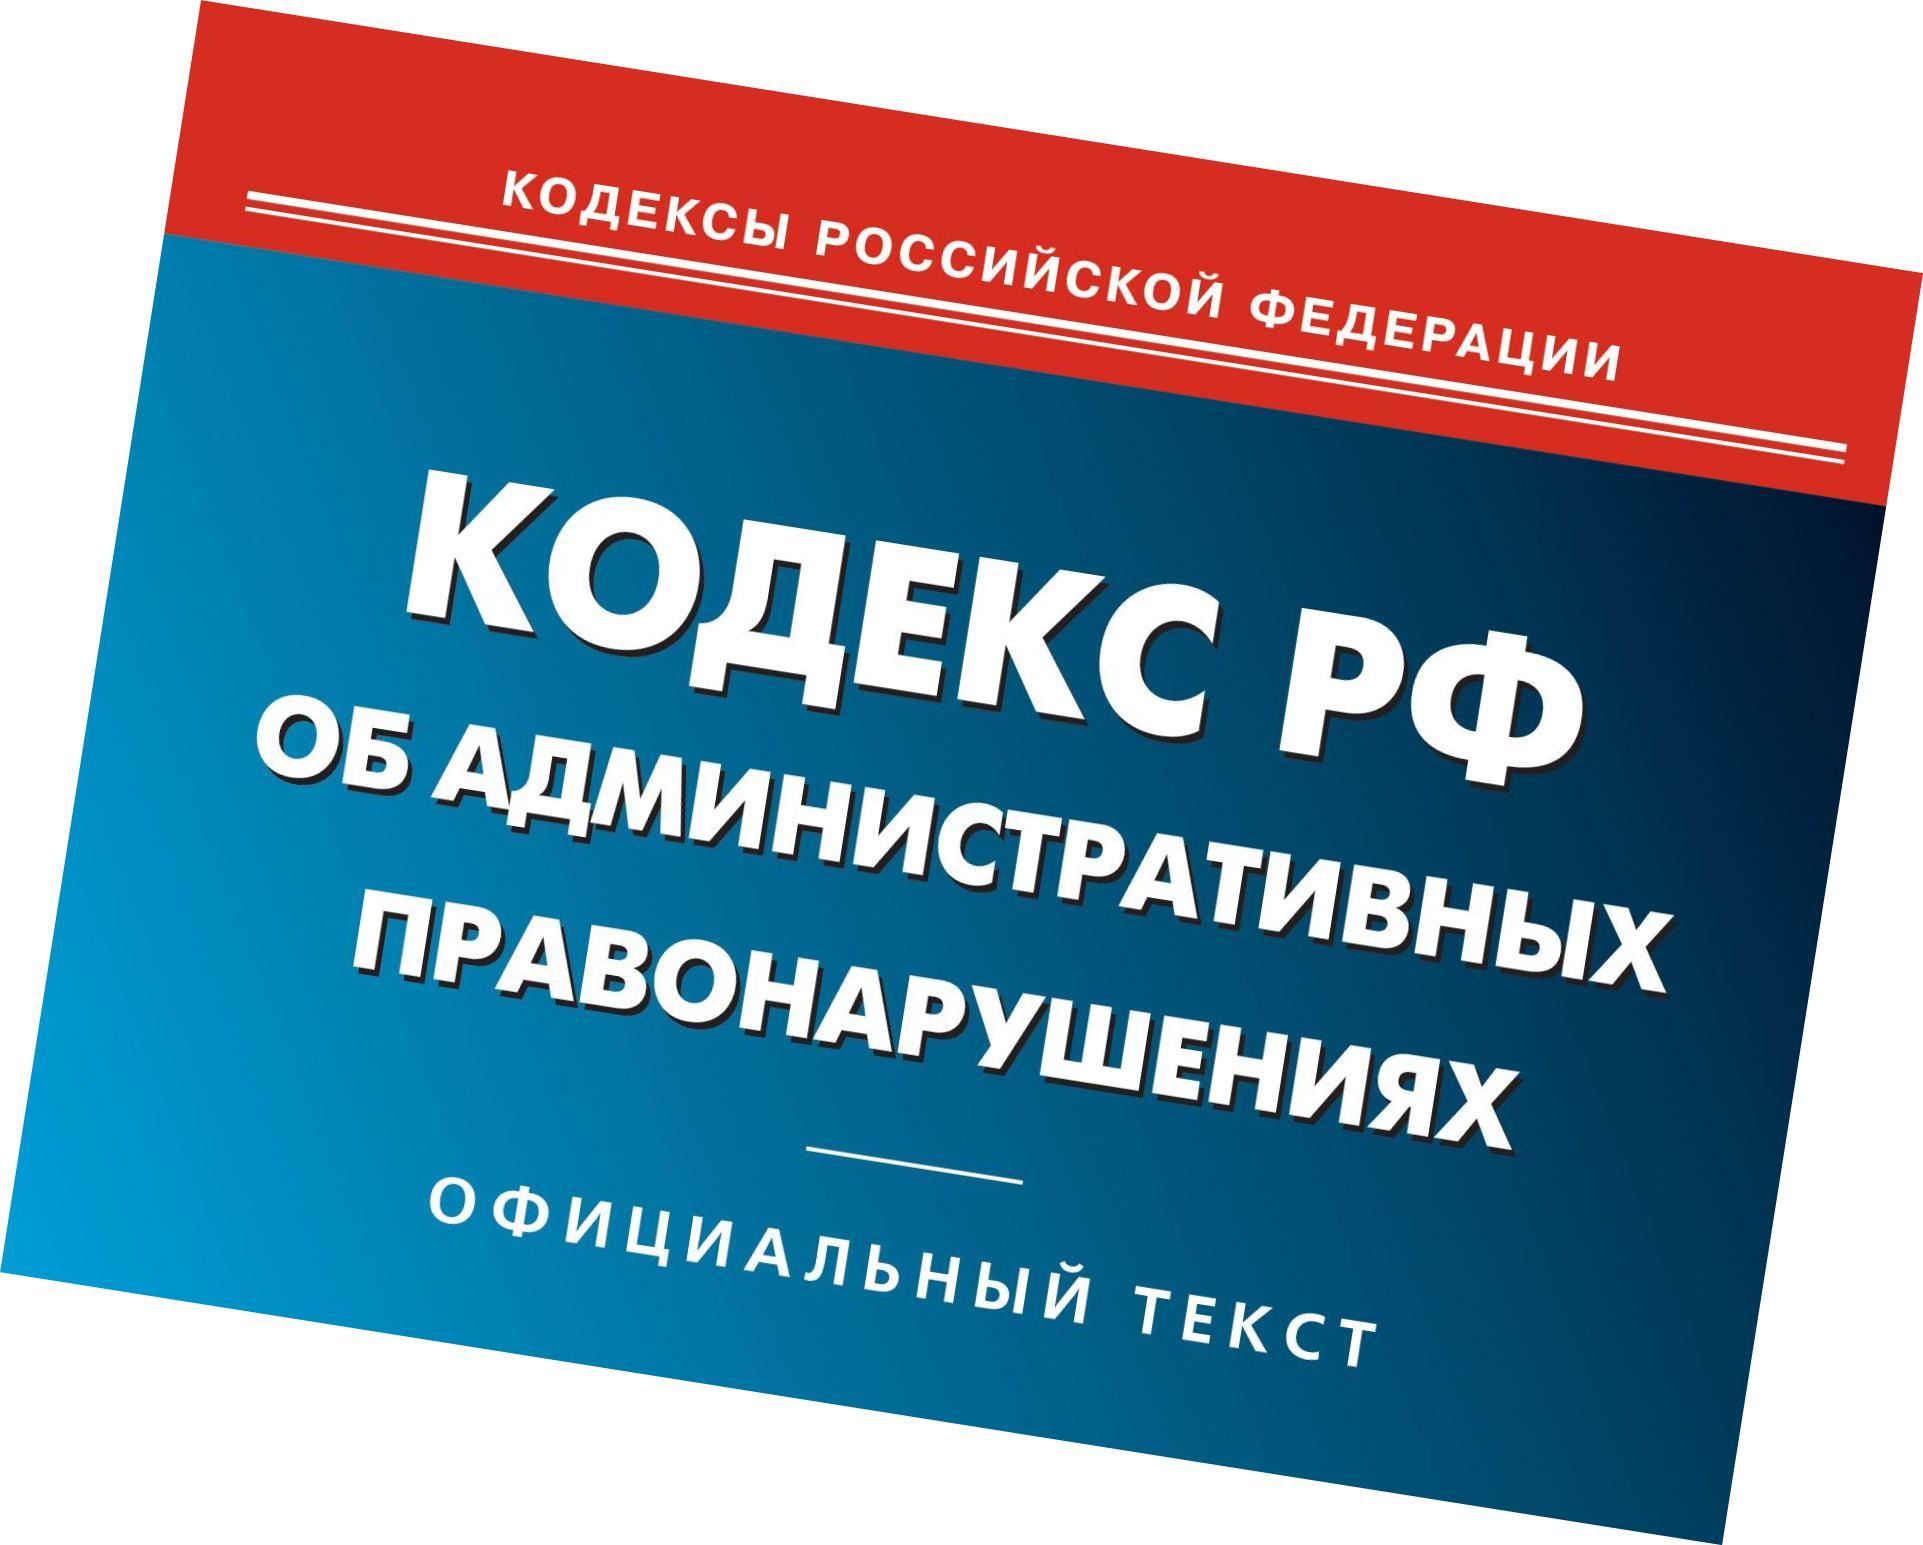 Признаки административного правонарушения